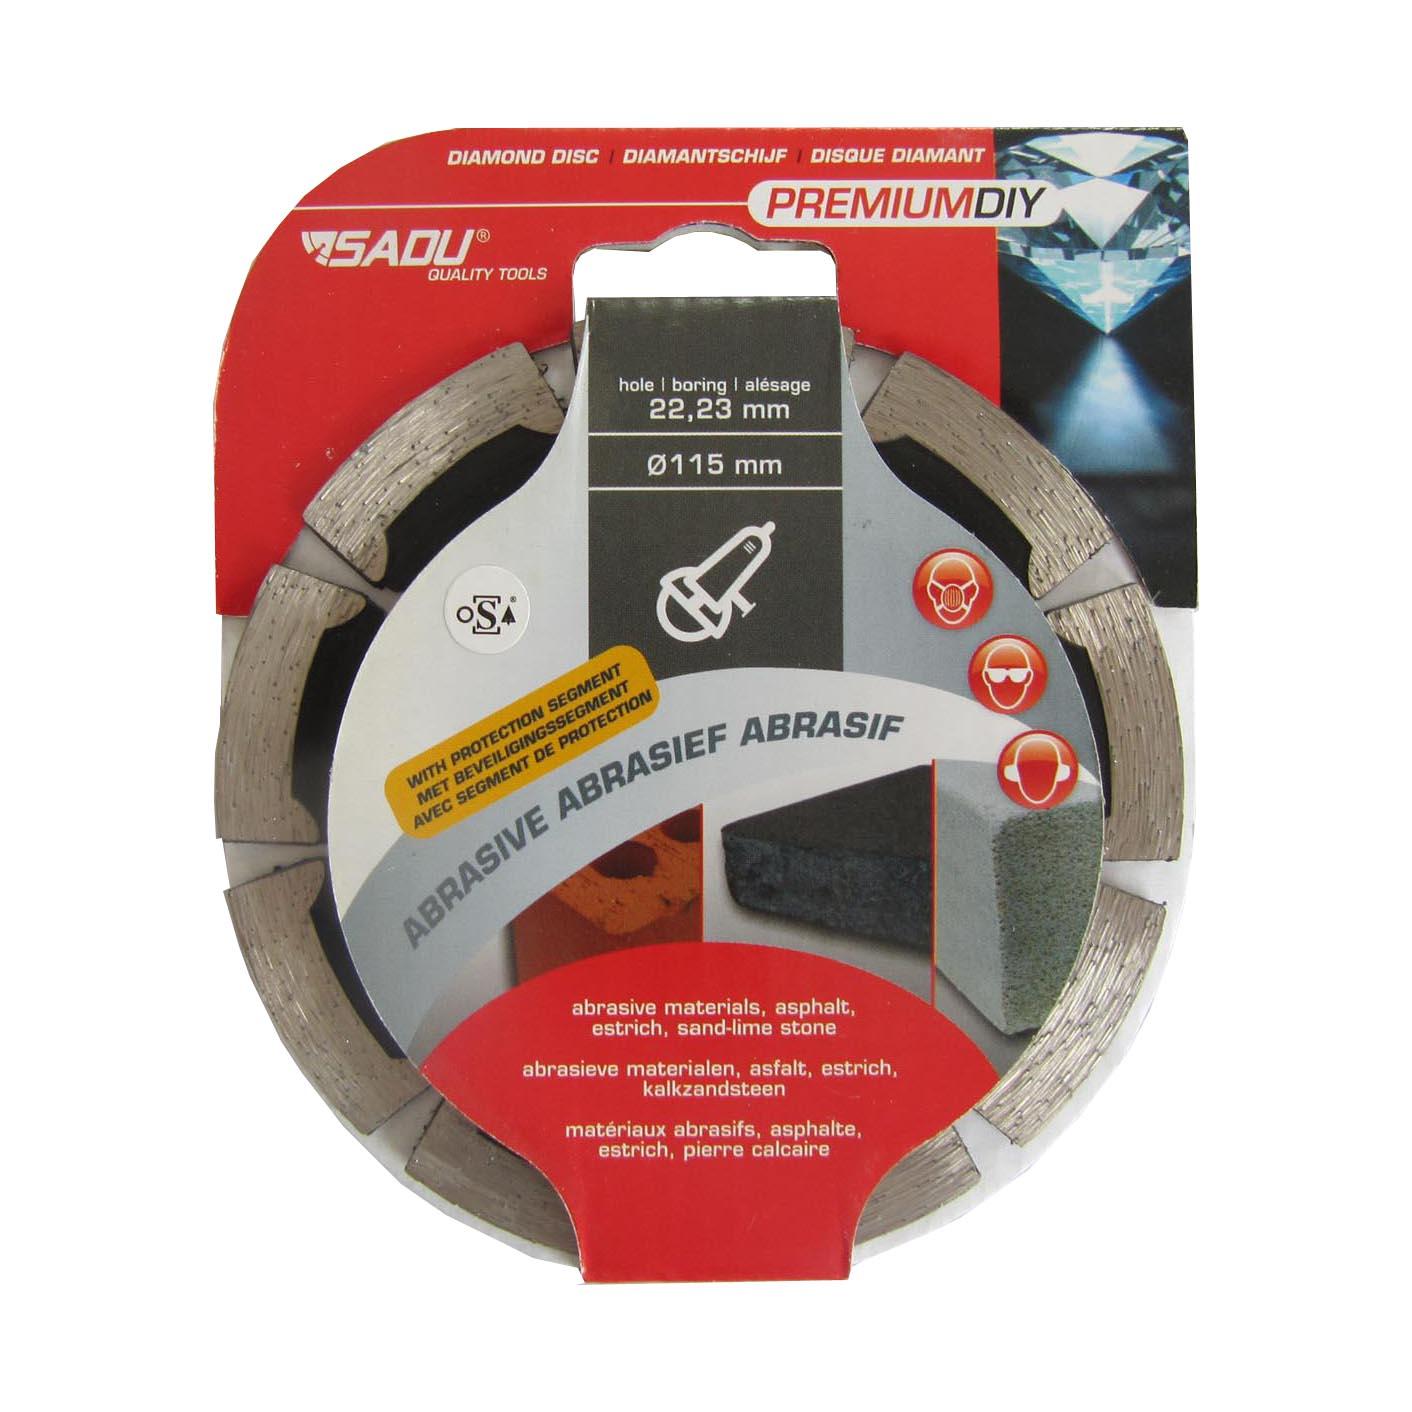 Diamond Disc Premium DIY 115x22, 23x8mm (slipmedel)